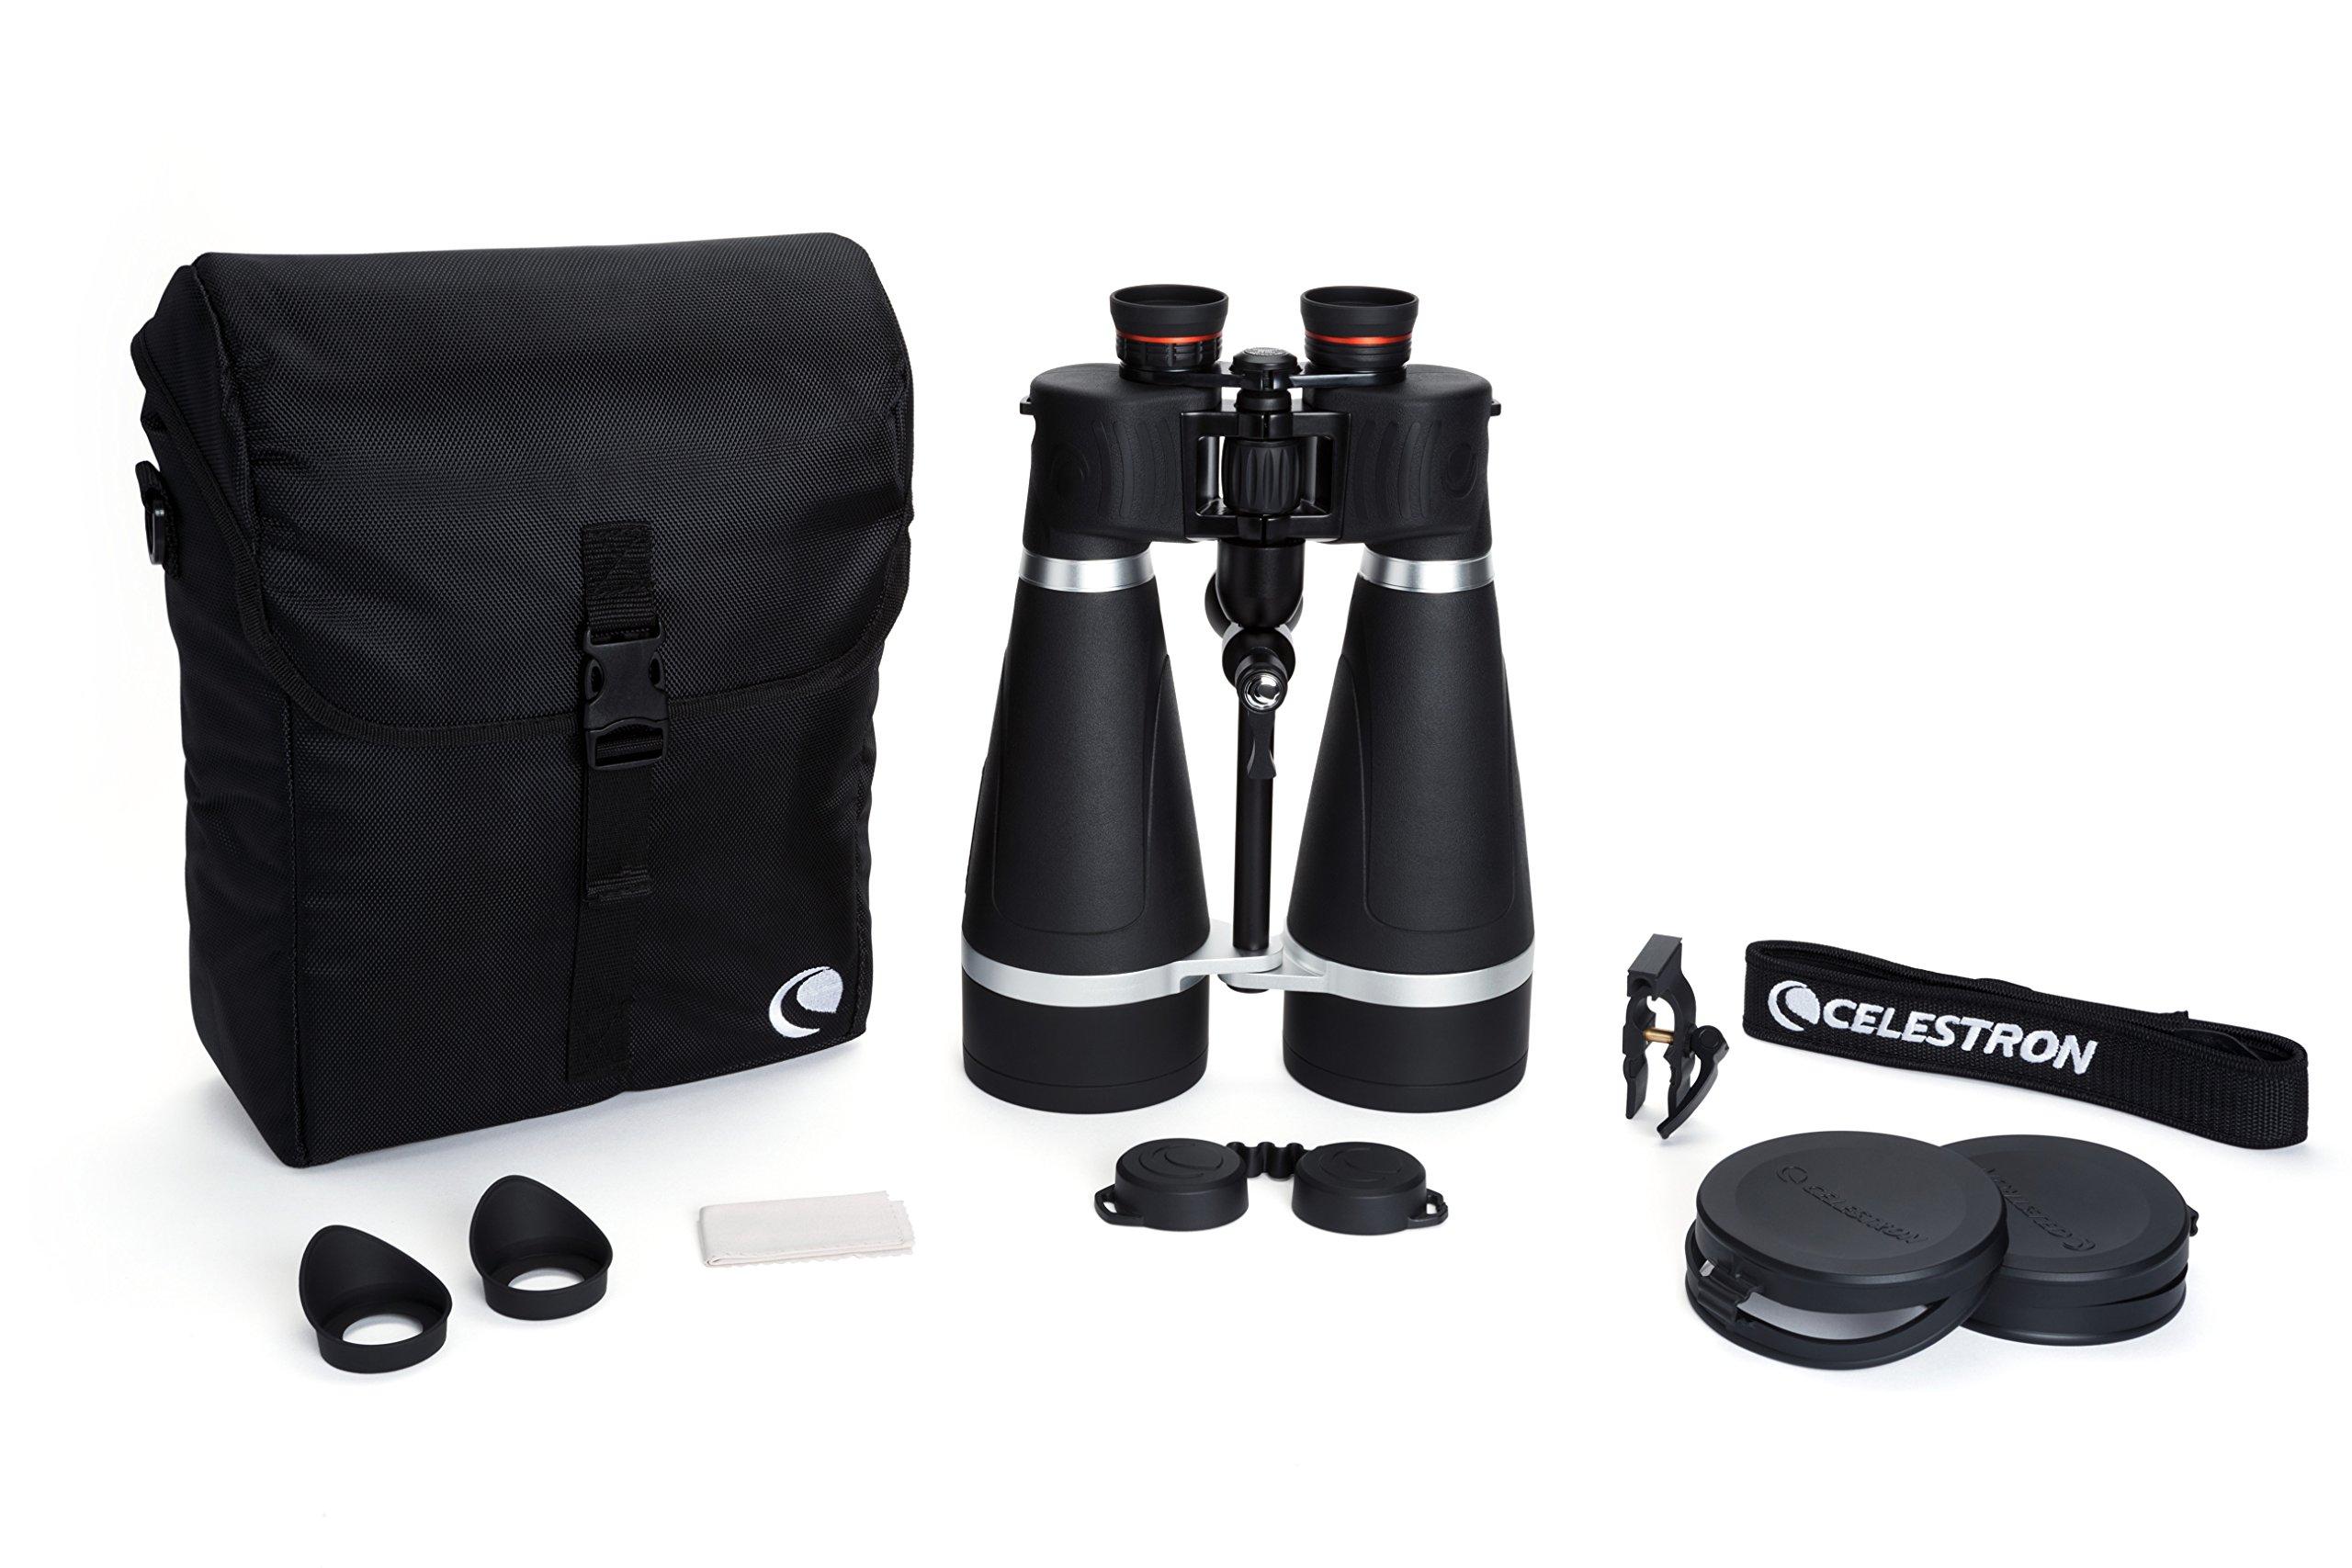 Celestron 20x80 SkyMaster Pro High Power Astronomy Binoculars by Celestron (Image #2)